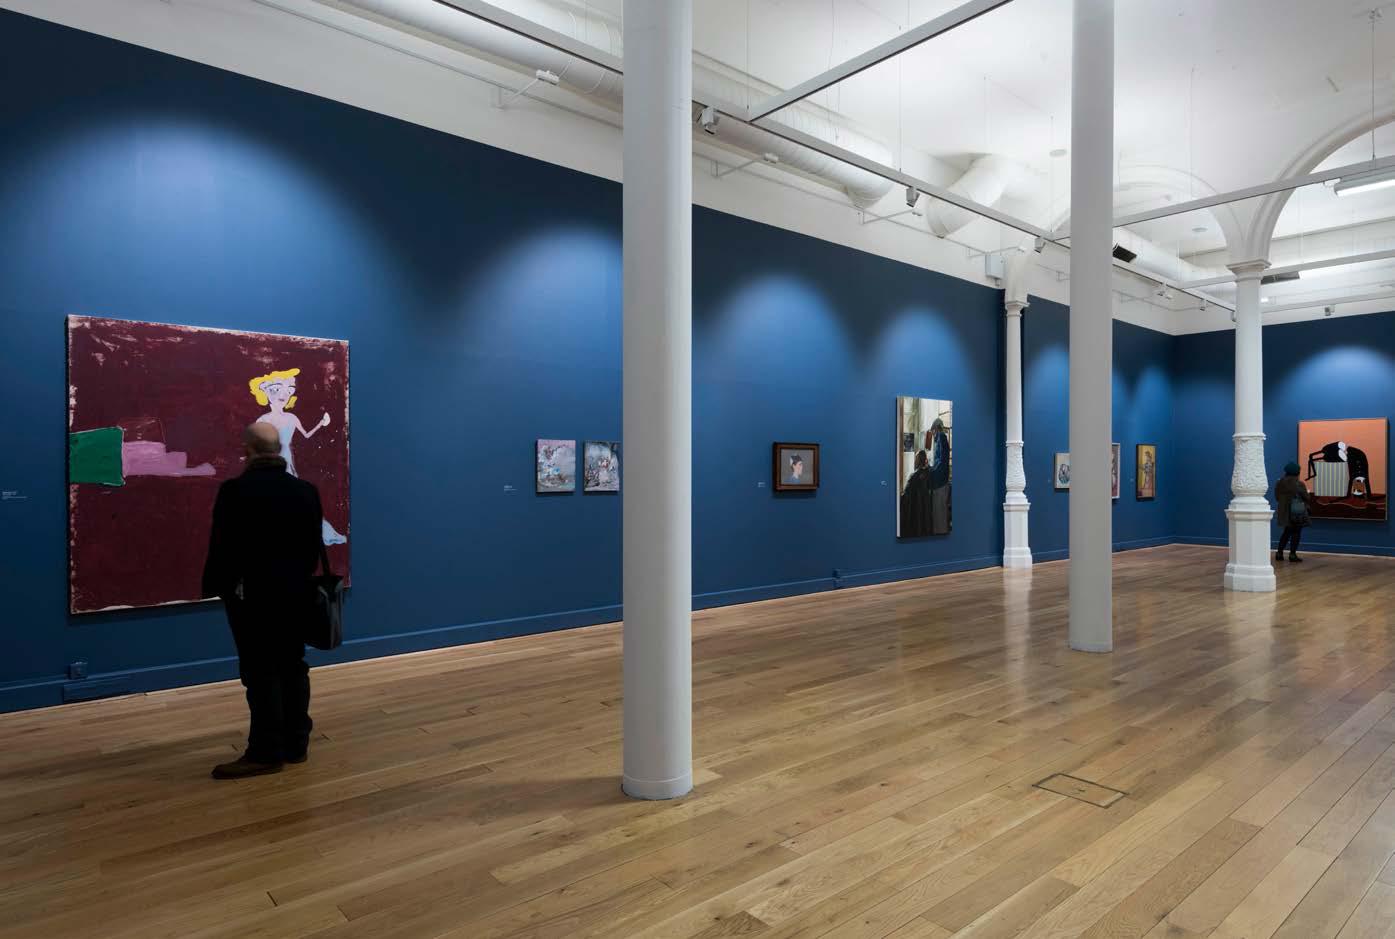 One Day, Something Happens: Paintings of People at Leeds Art Gallery, 2015